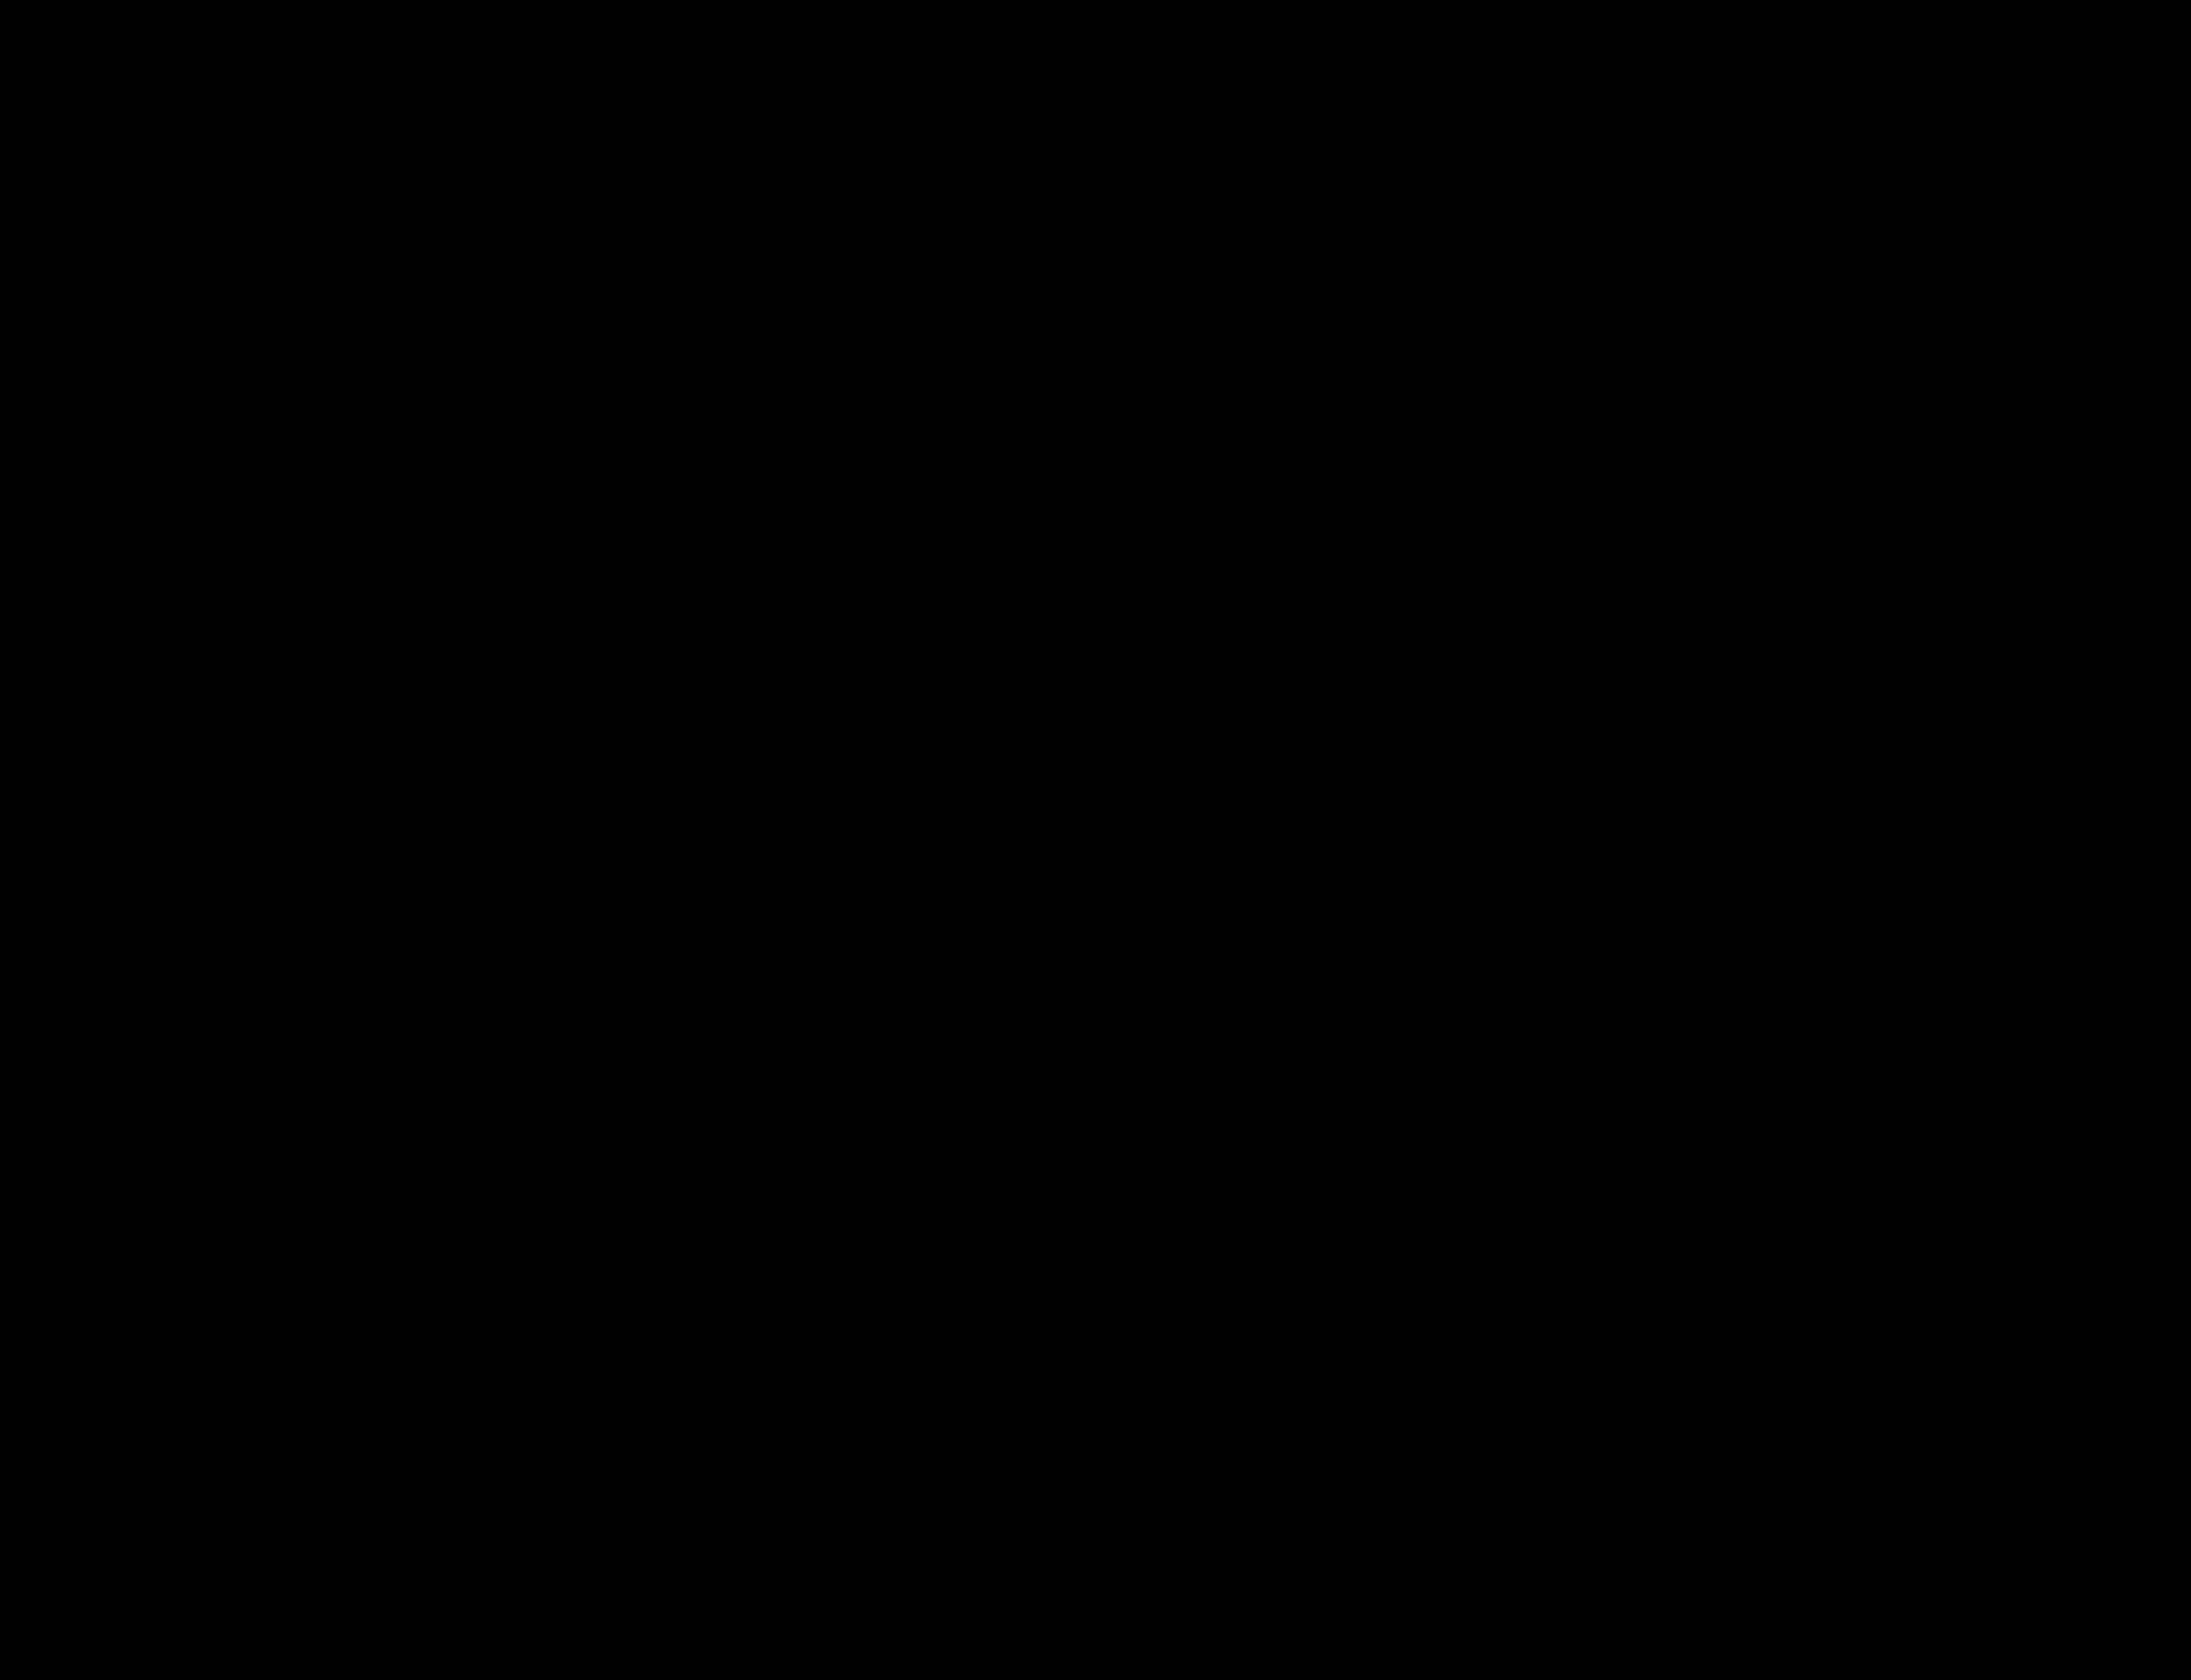 2400x1840 Clipart